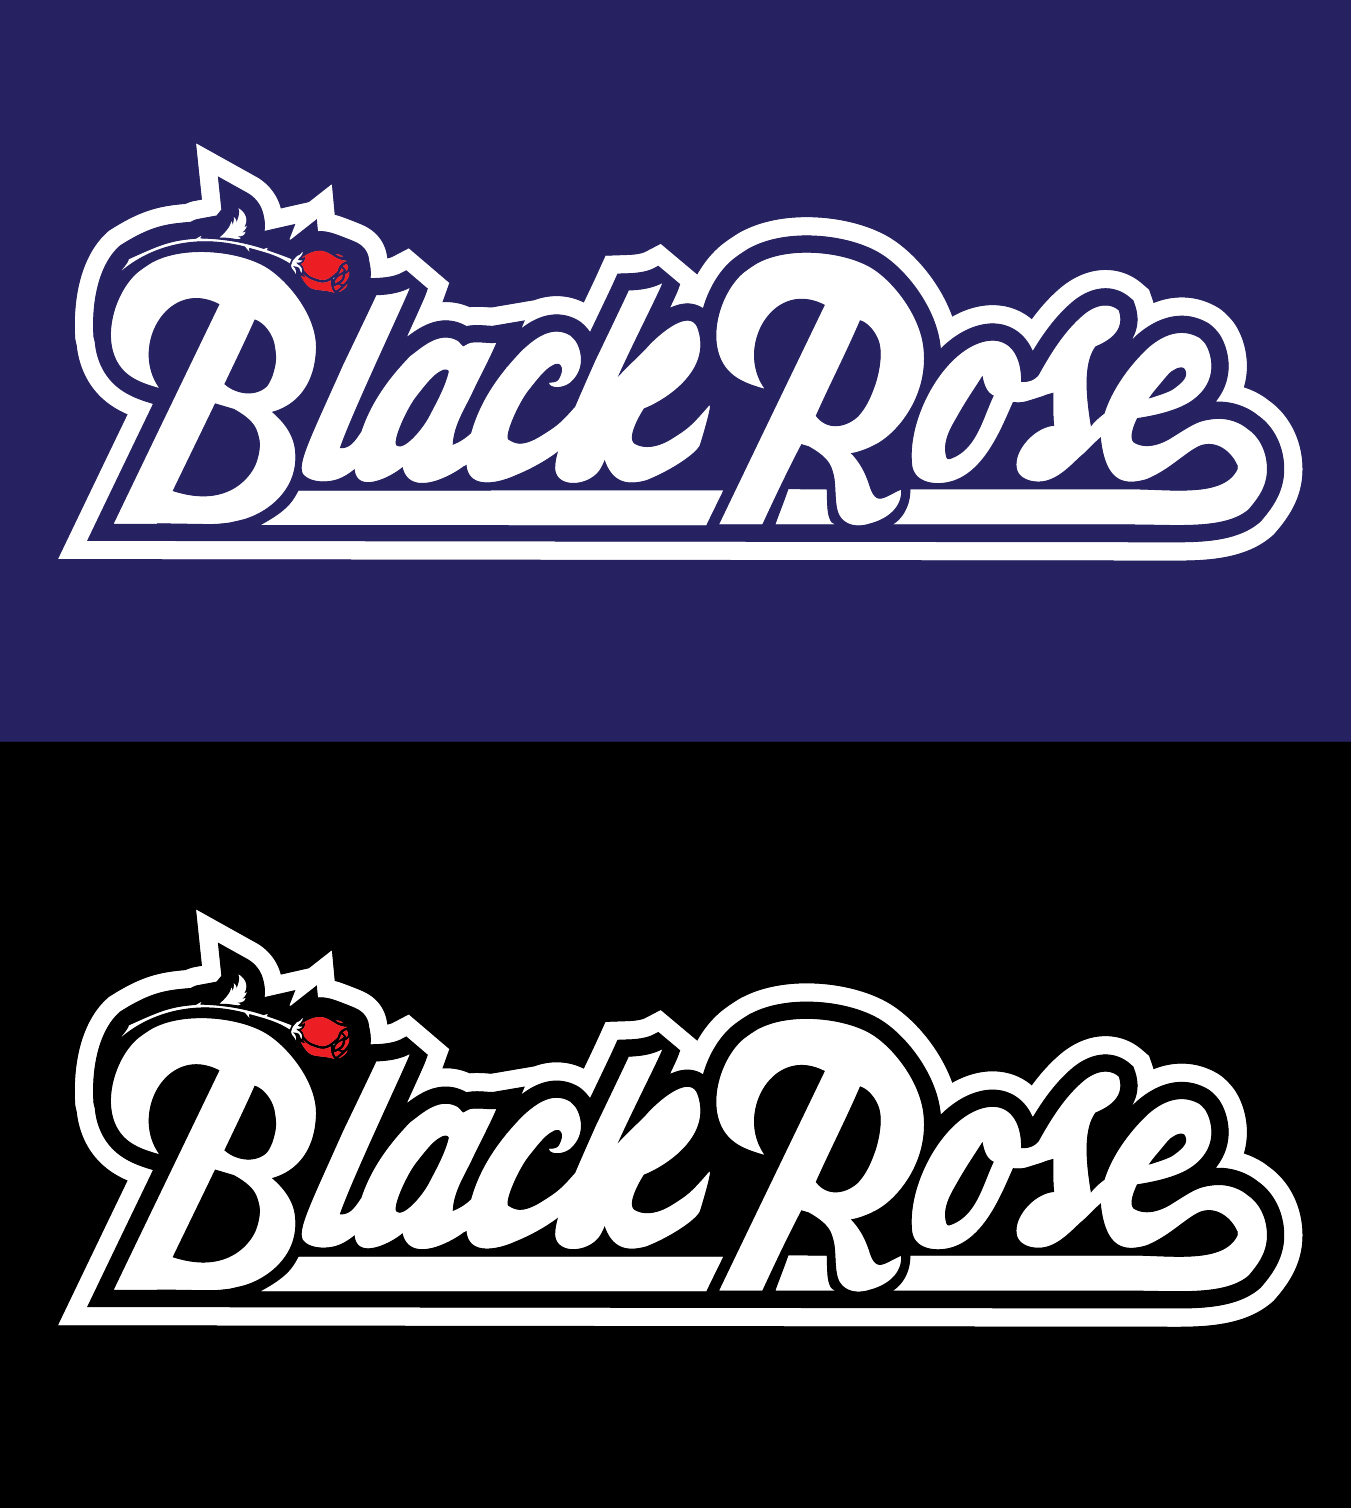 Black Rose 7.jpg